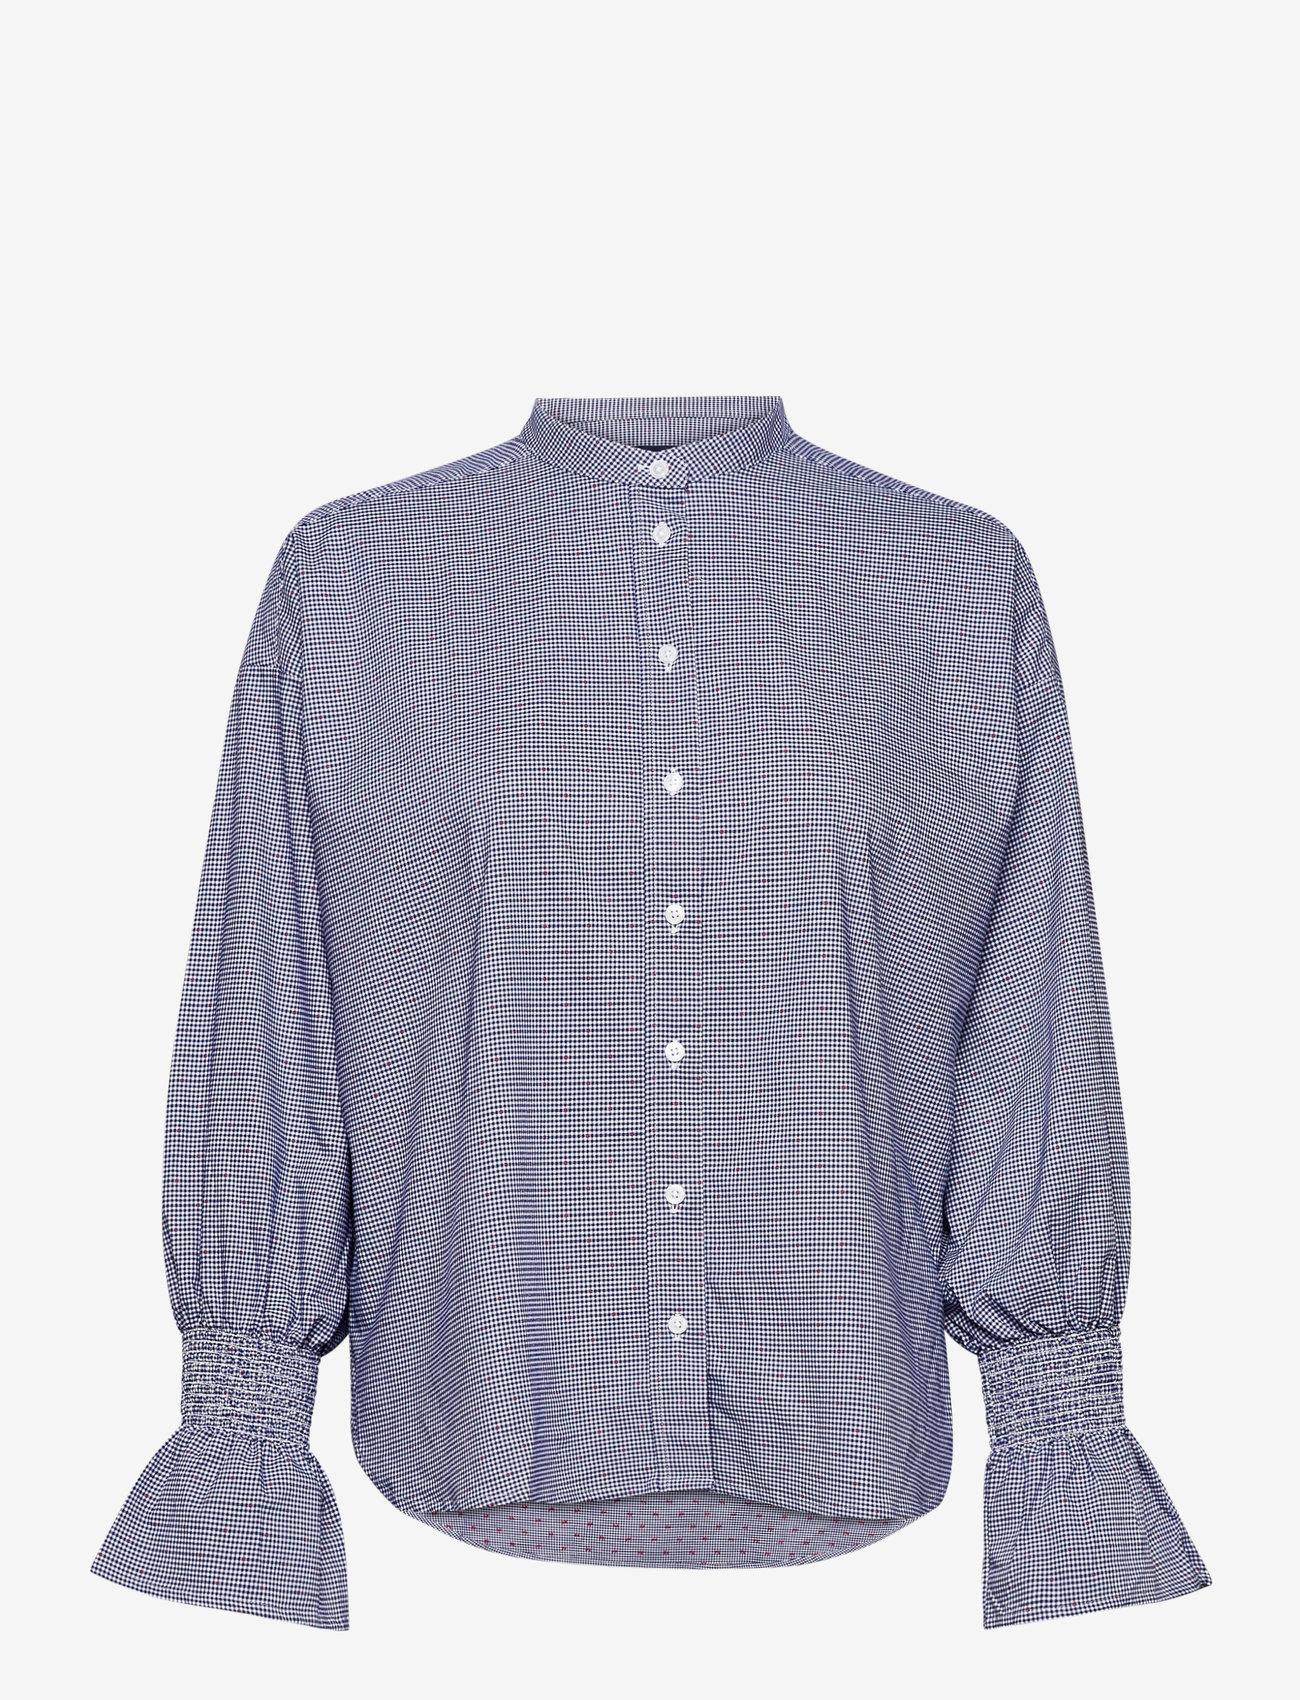 GANT - D1. TP SMOCK SLEEVE CHECK SHIRT - long-sleeved shirts - crisp blue - 0